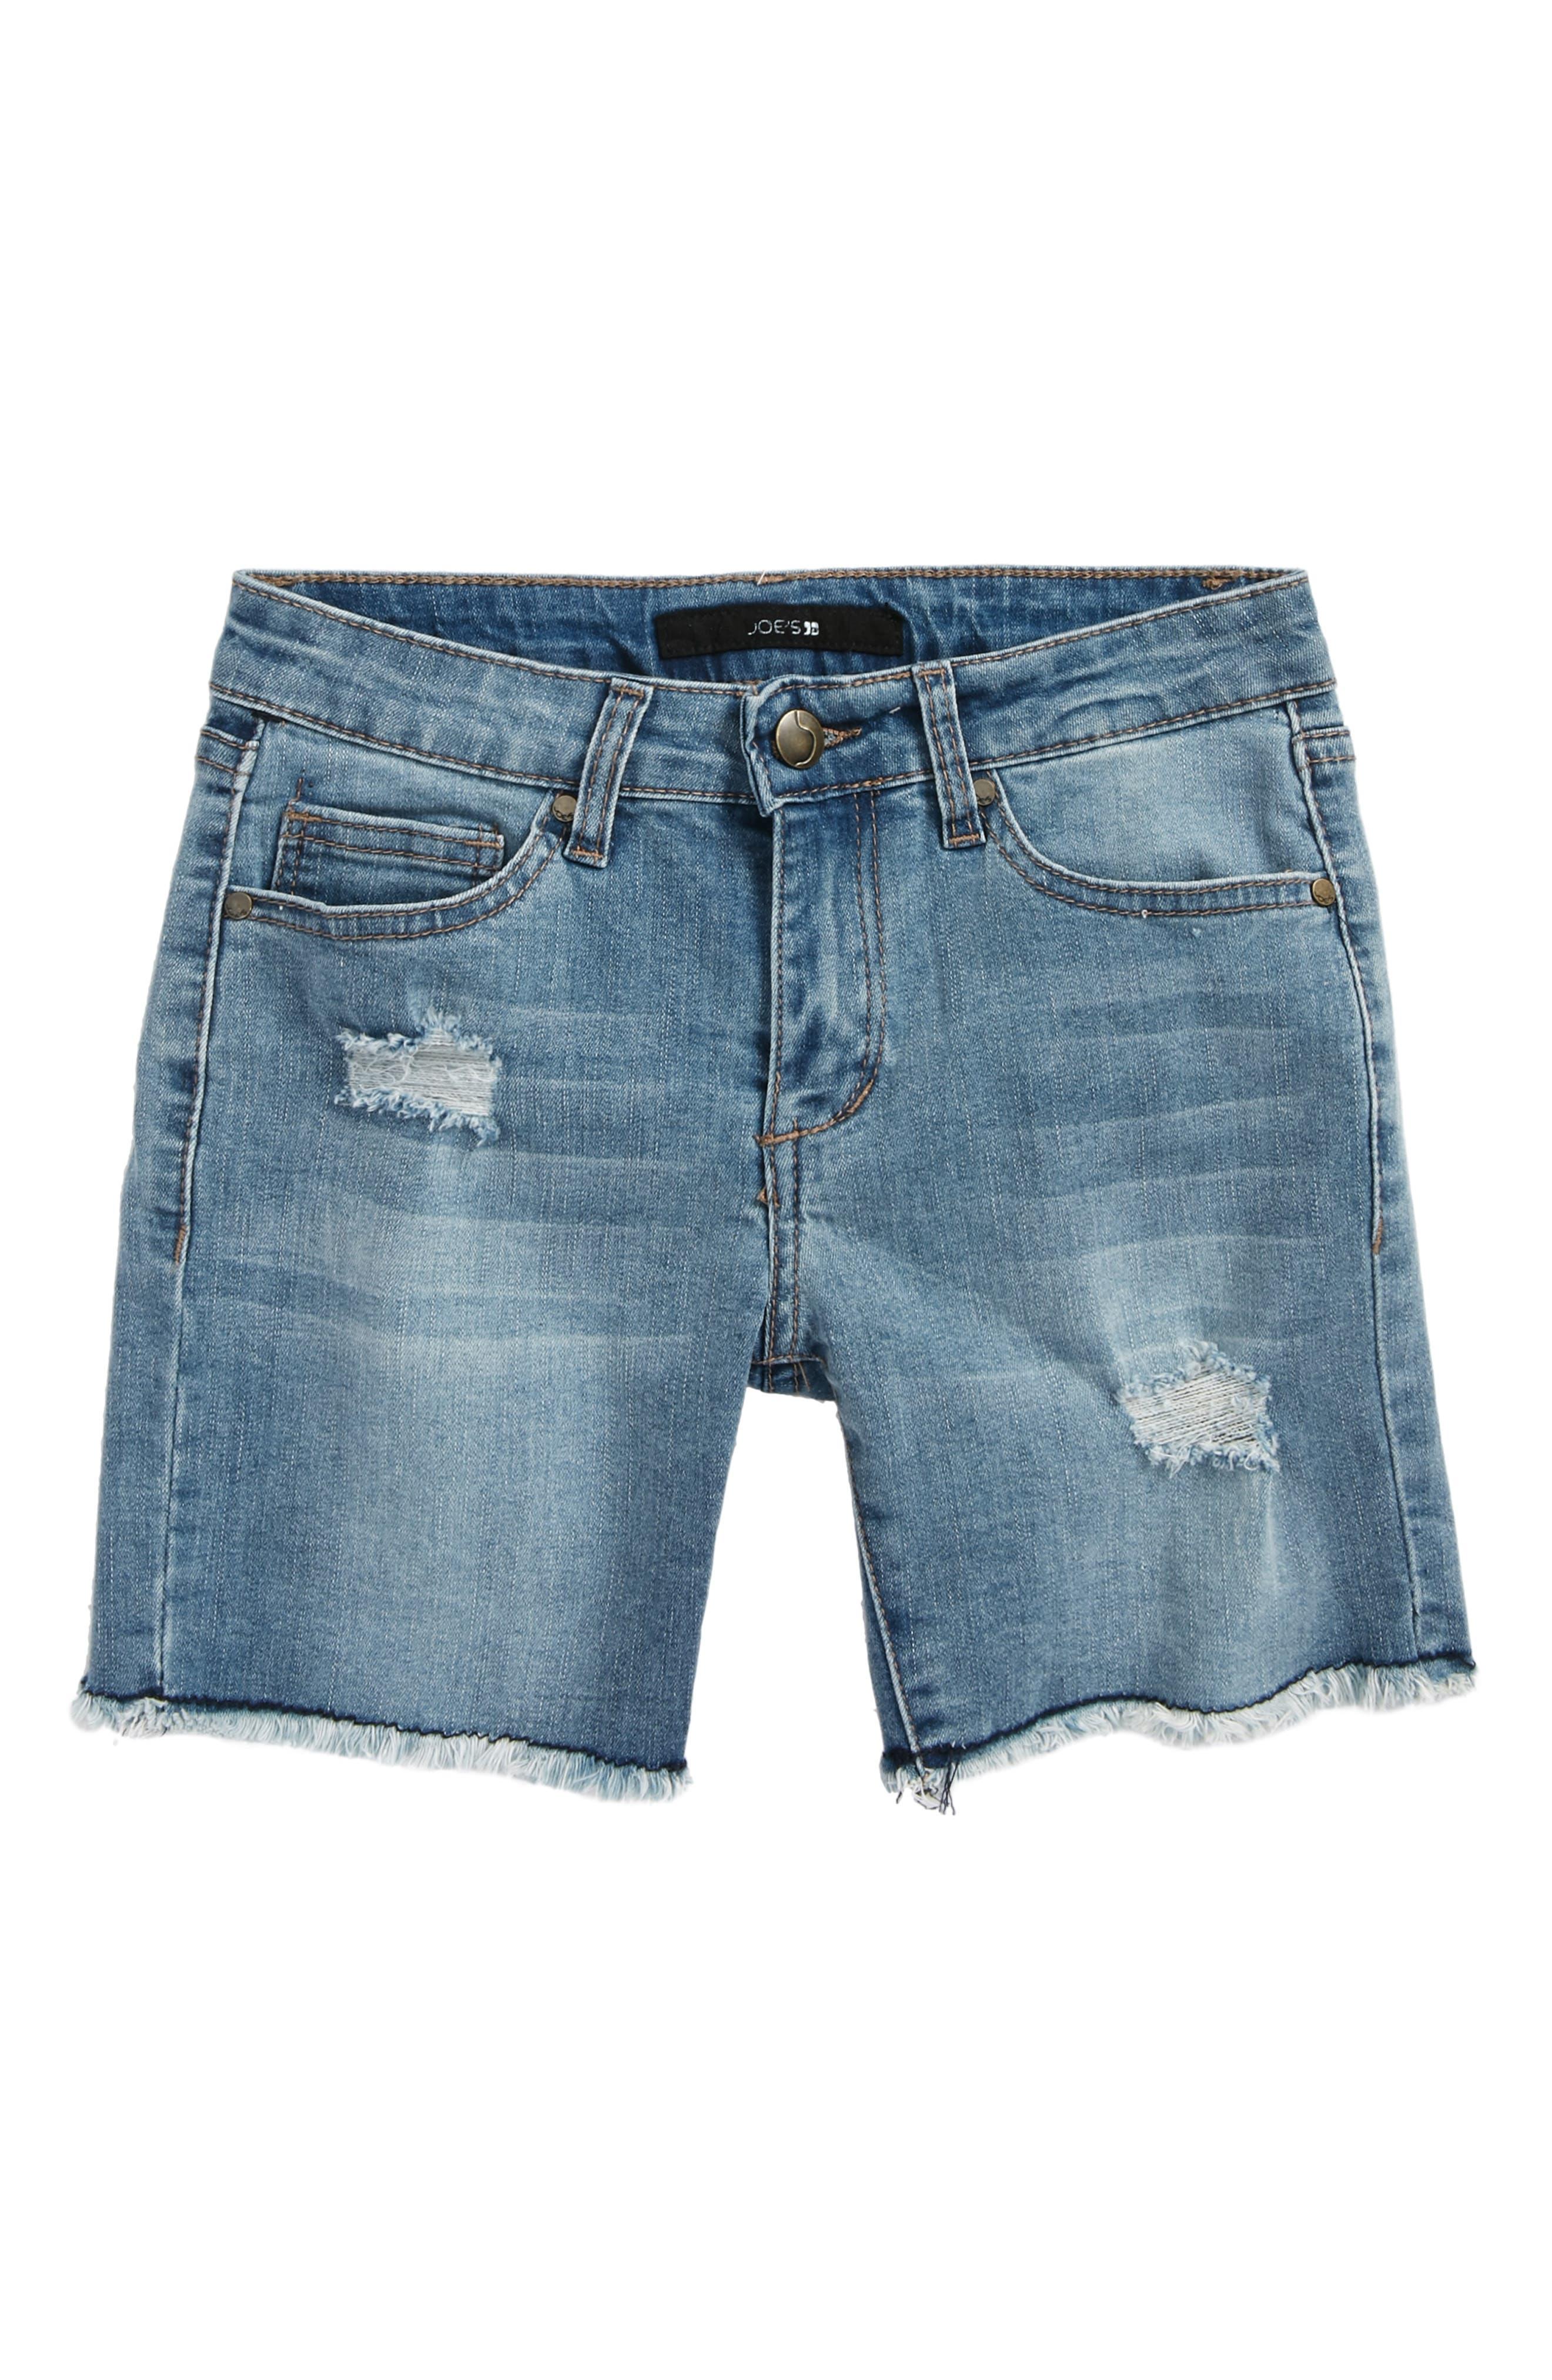 Frayed Mid Rise Bermuda Denim Shorts,                             Main thumbnail 1, color,                             Mdw-Medium Wash